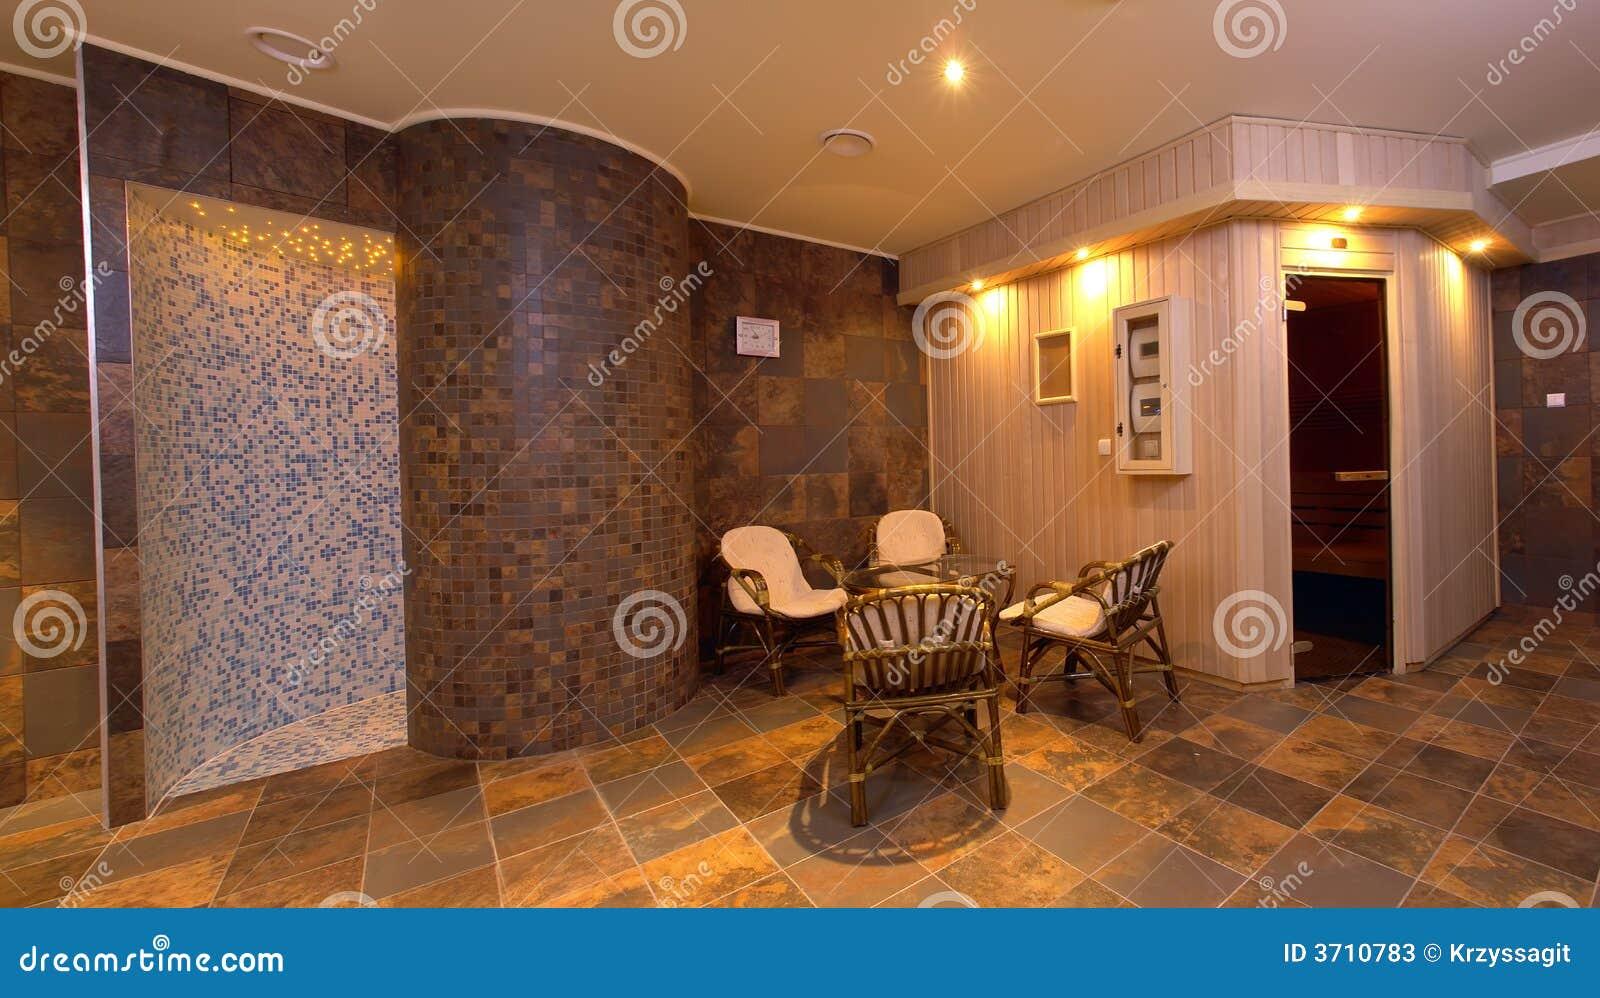 Spa Sauna Interior Decor Stock Image Image Of Decor